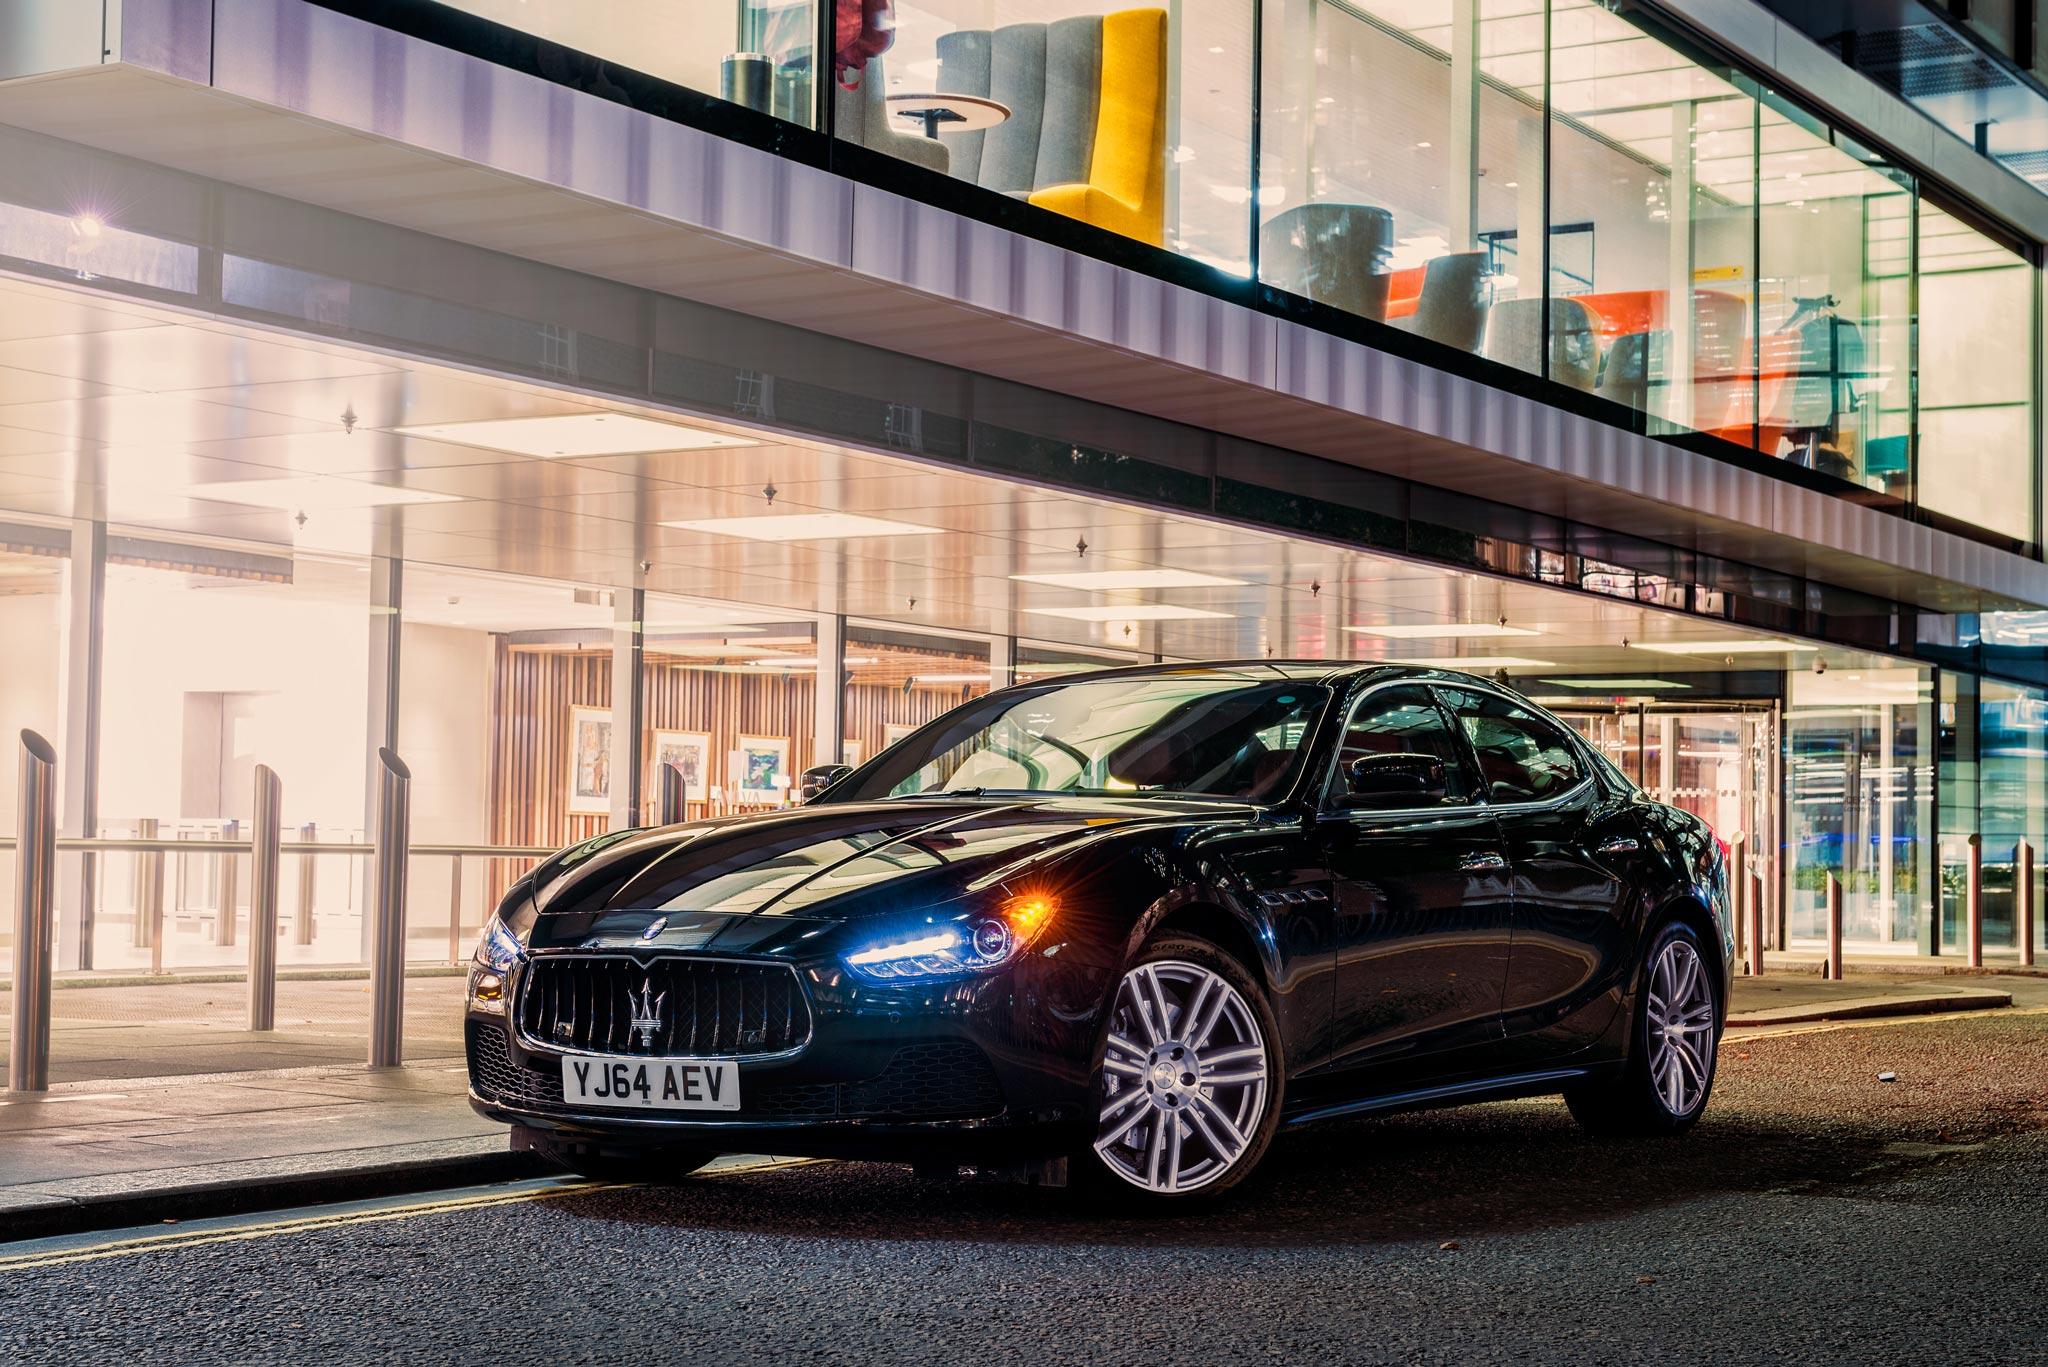 Maserati Ghibli Sports & Luxury Vehicle Photography Dean Wright Automotive